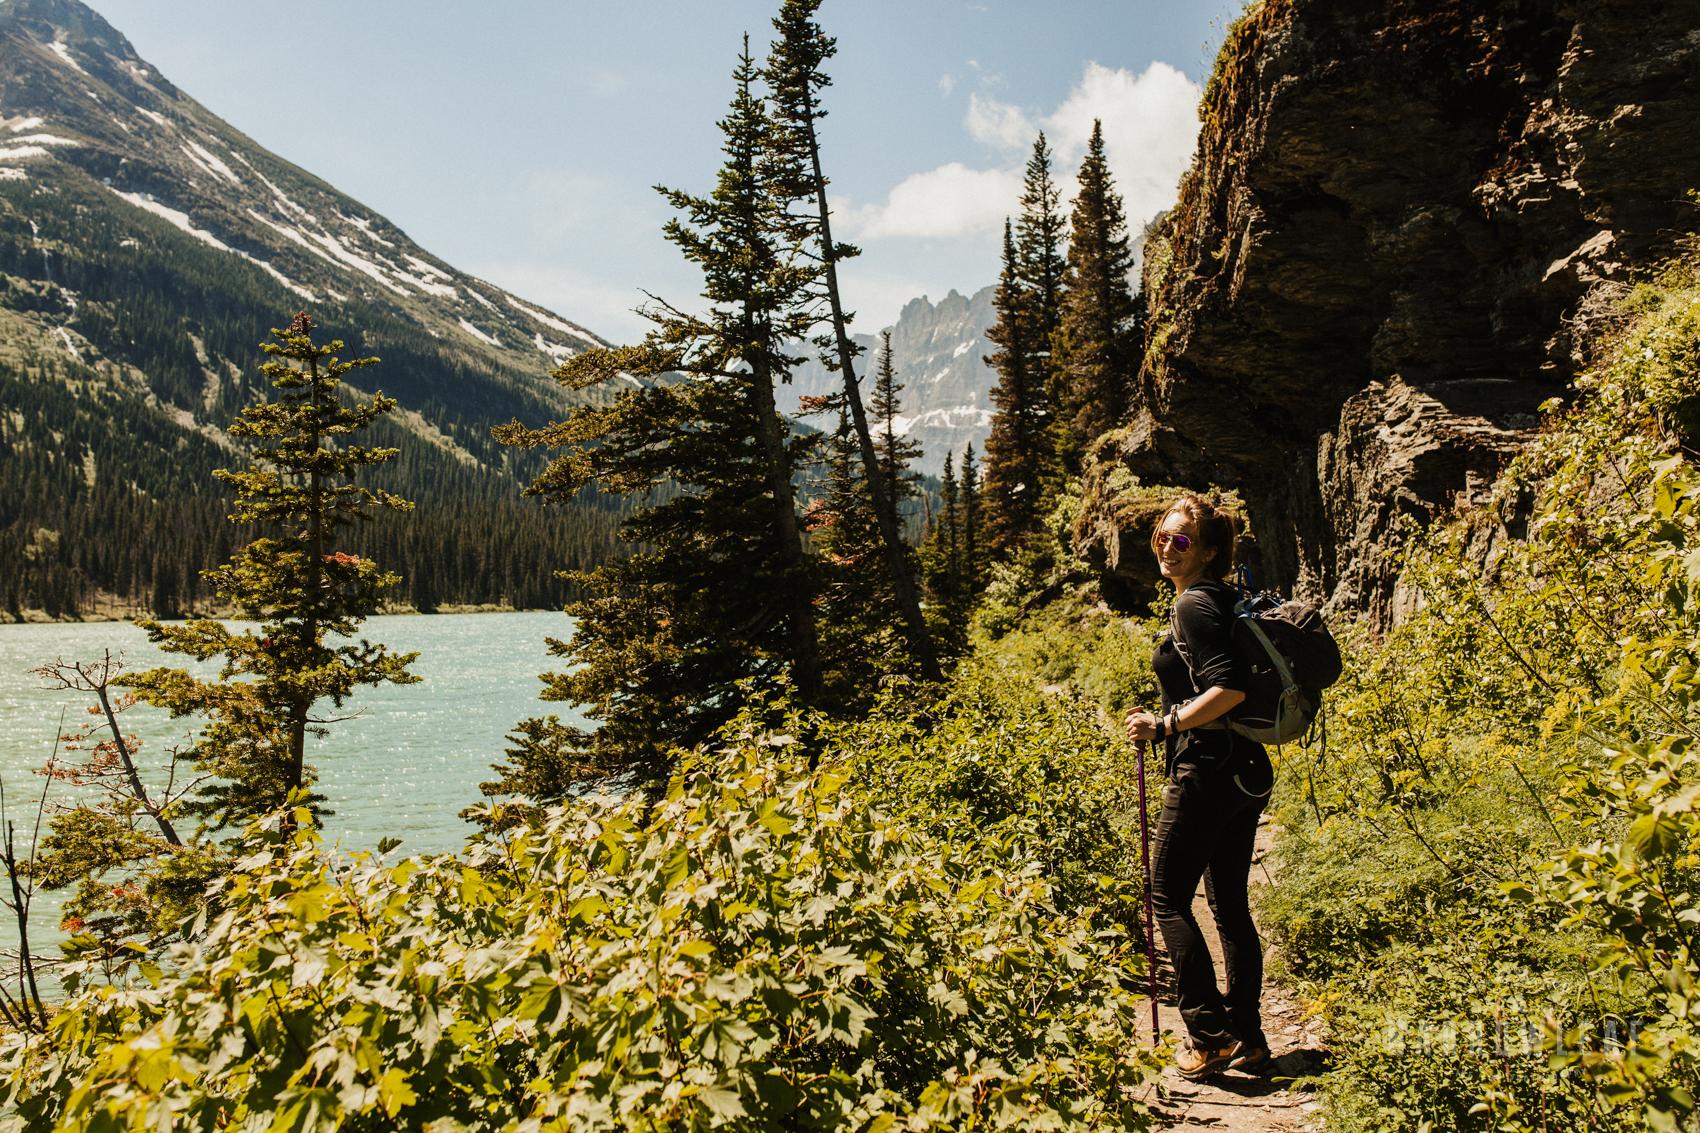 Montana-Glacier-National-Park-Many-Glacier-Narrowleaf-Love-and-Adventure-elopement-Photography-9430.jpg